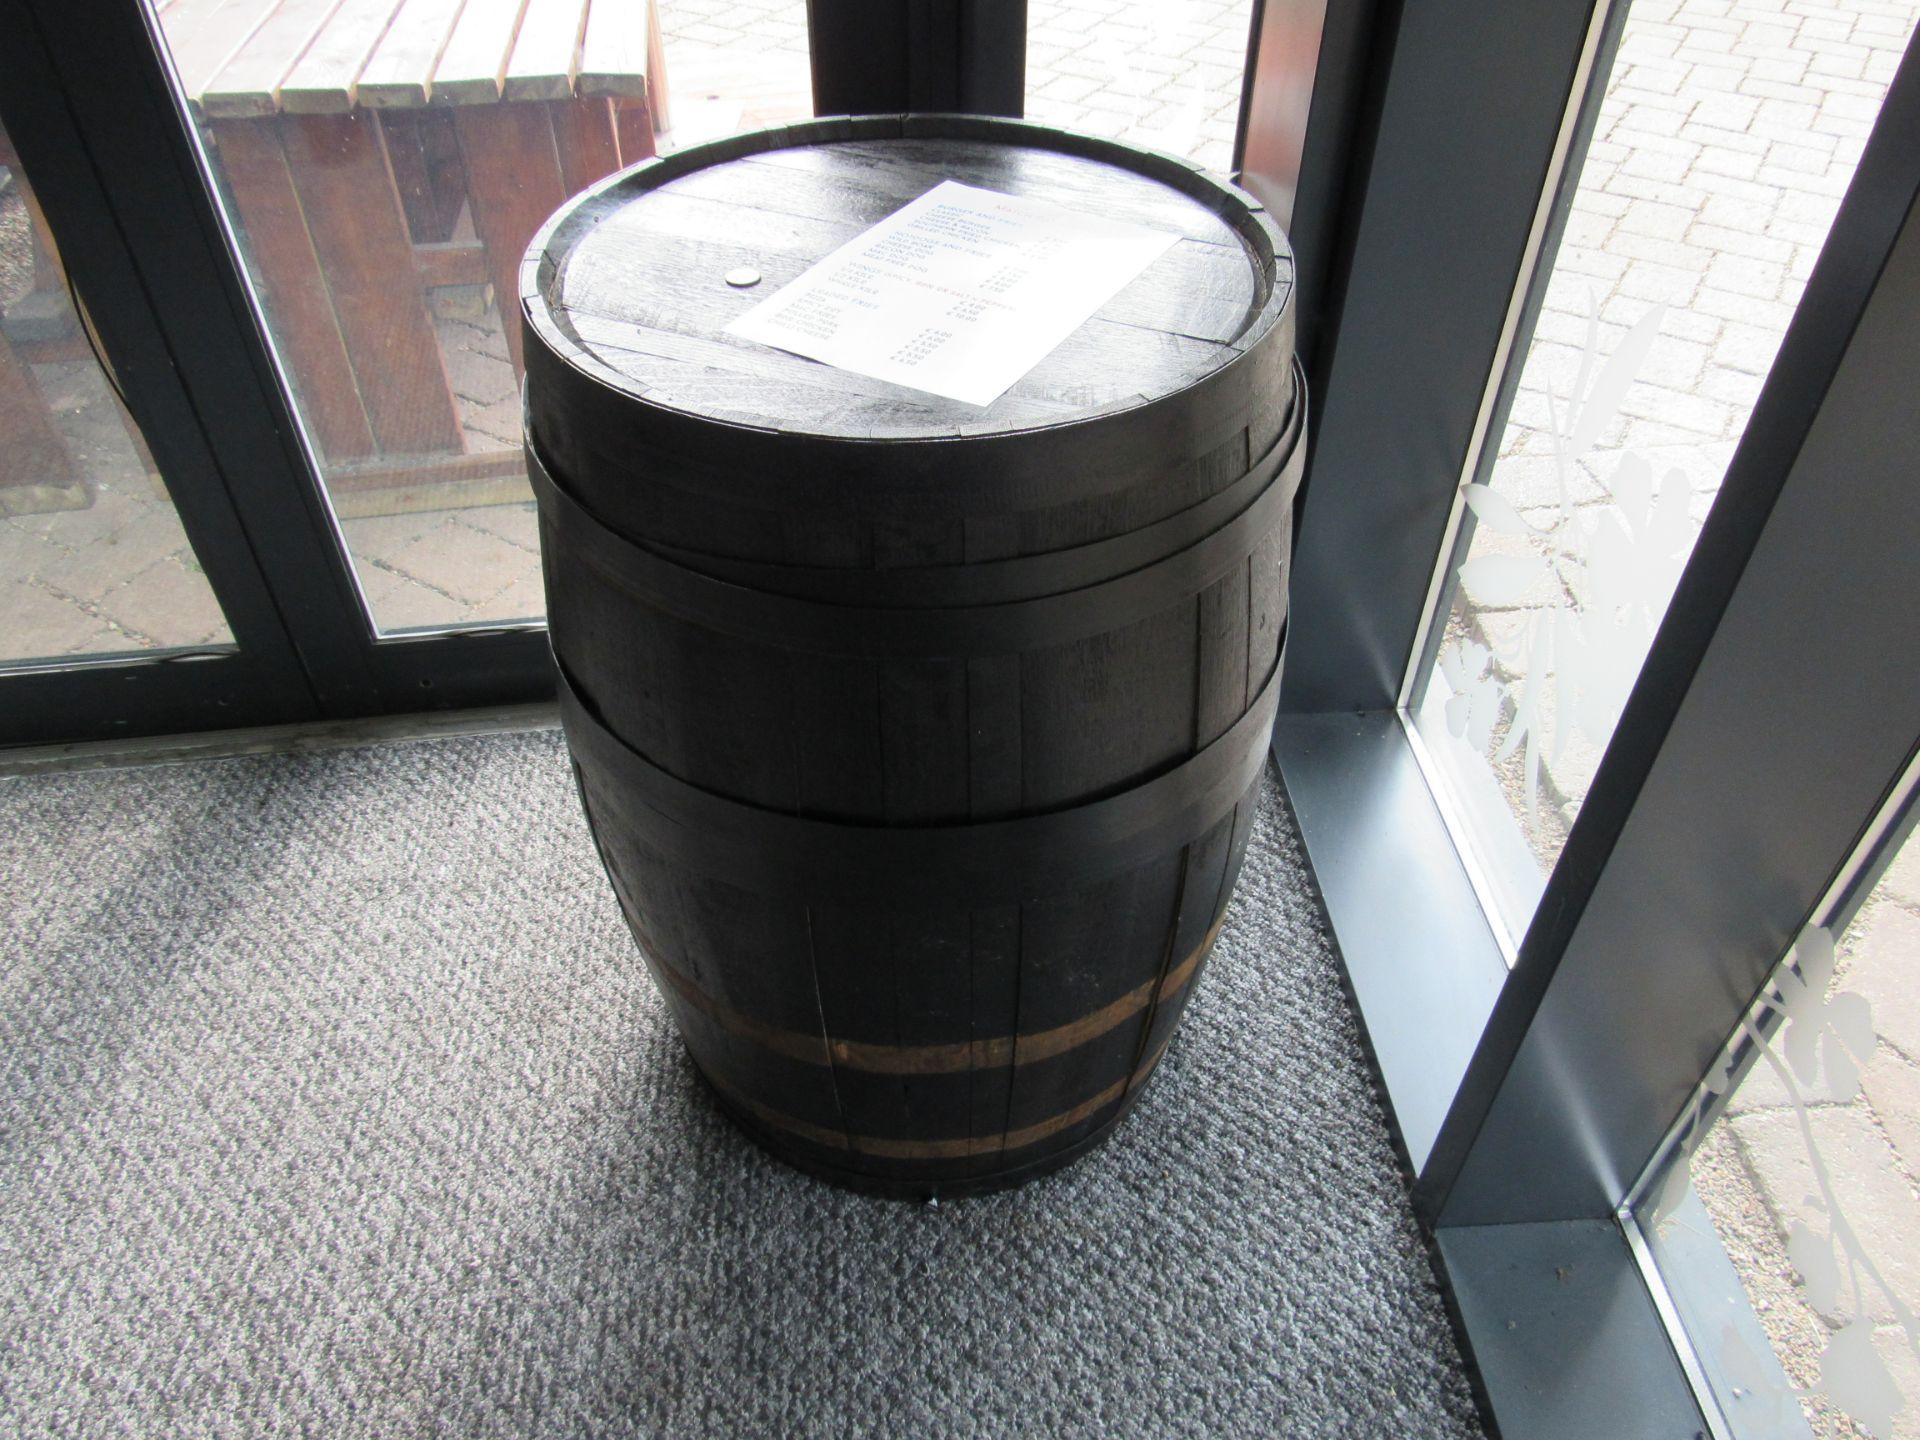 Distillery Barrel - Image 2 of 2